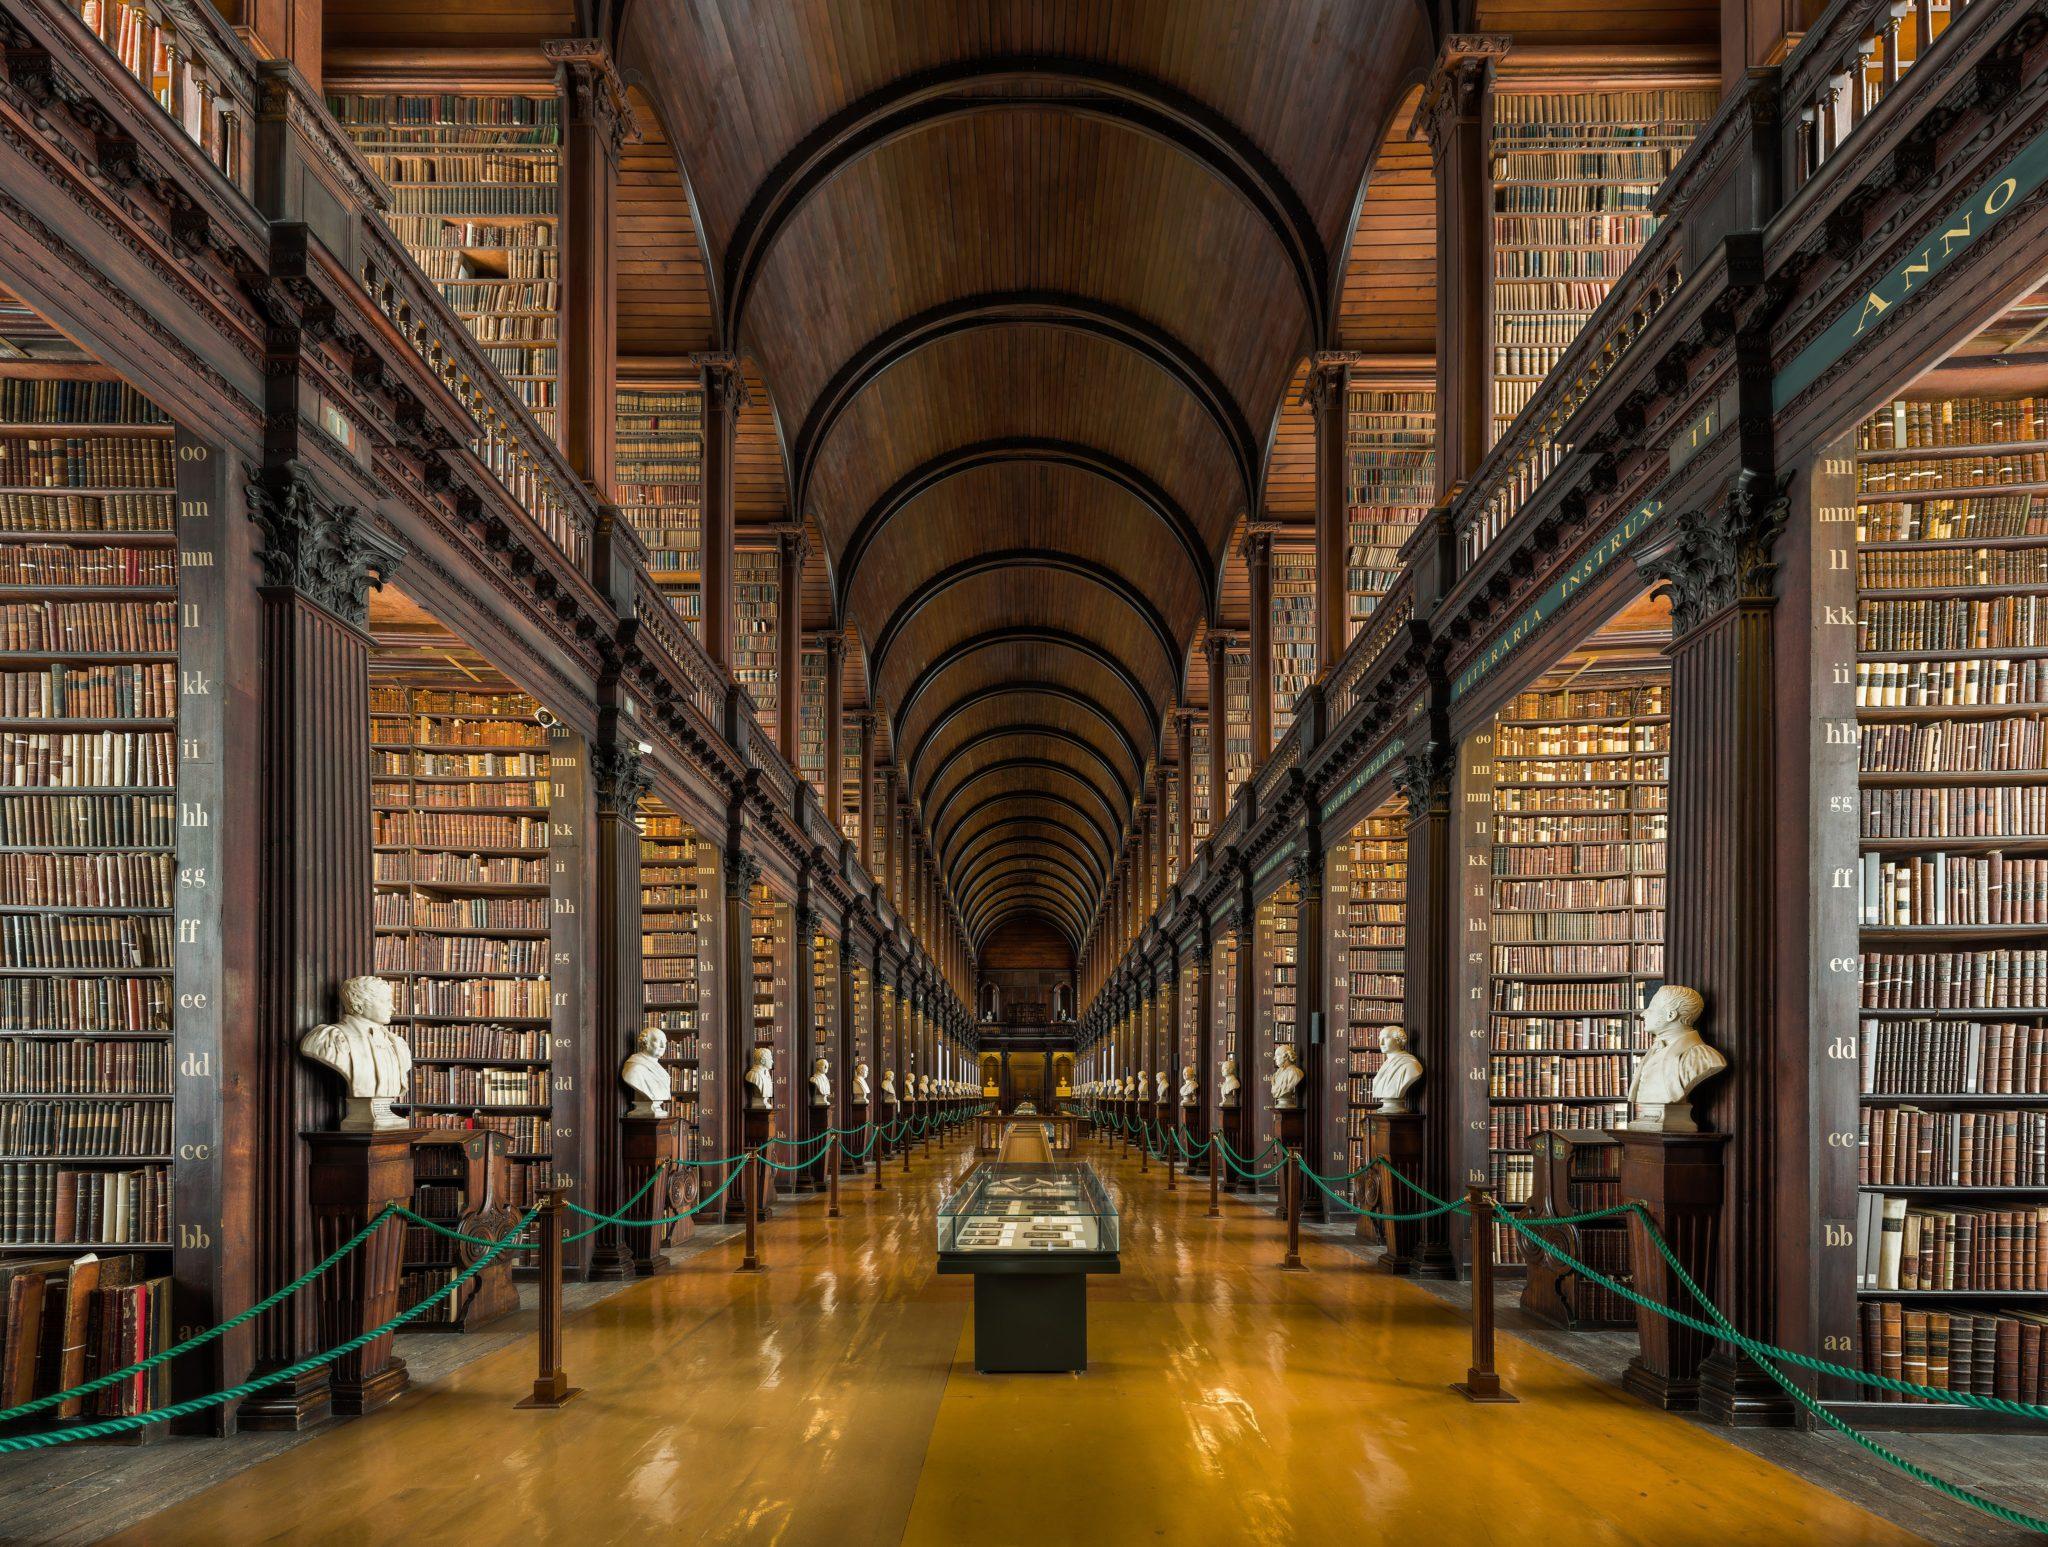 https://upload.wikimedia.org/wikipedia/commons/4/4b/Long_Room_Interior%2C_Trinity_College_Dublin%2C_Ireland_-_Diliff.jpg